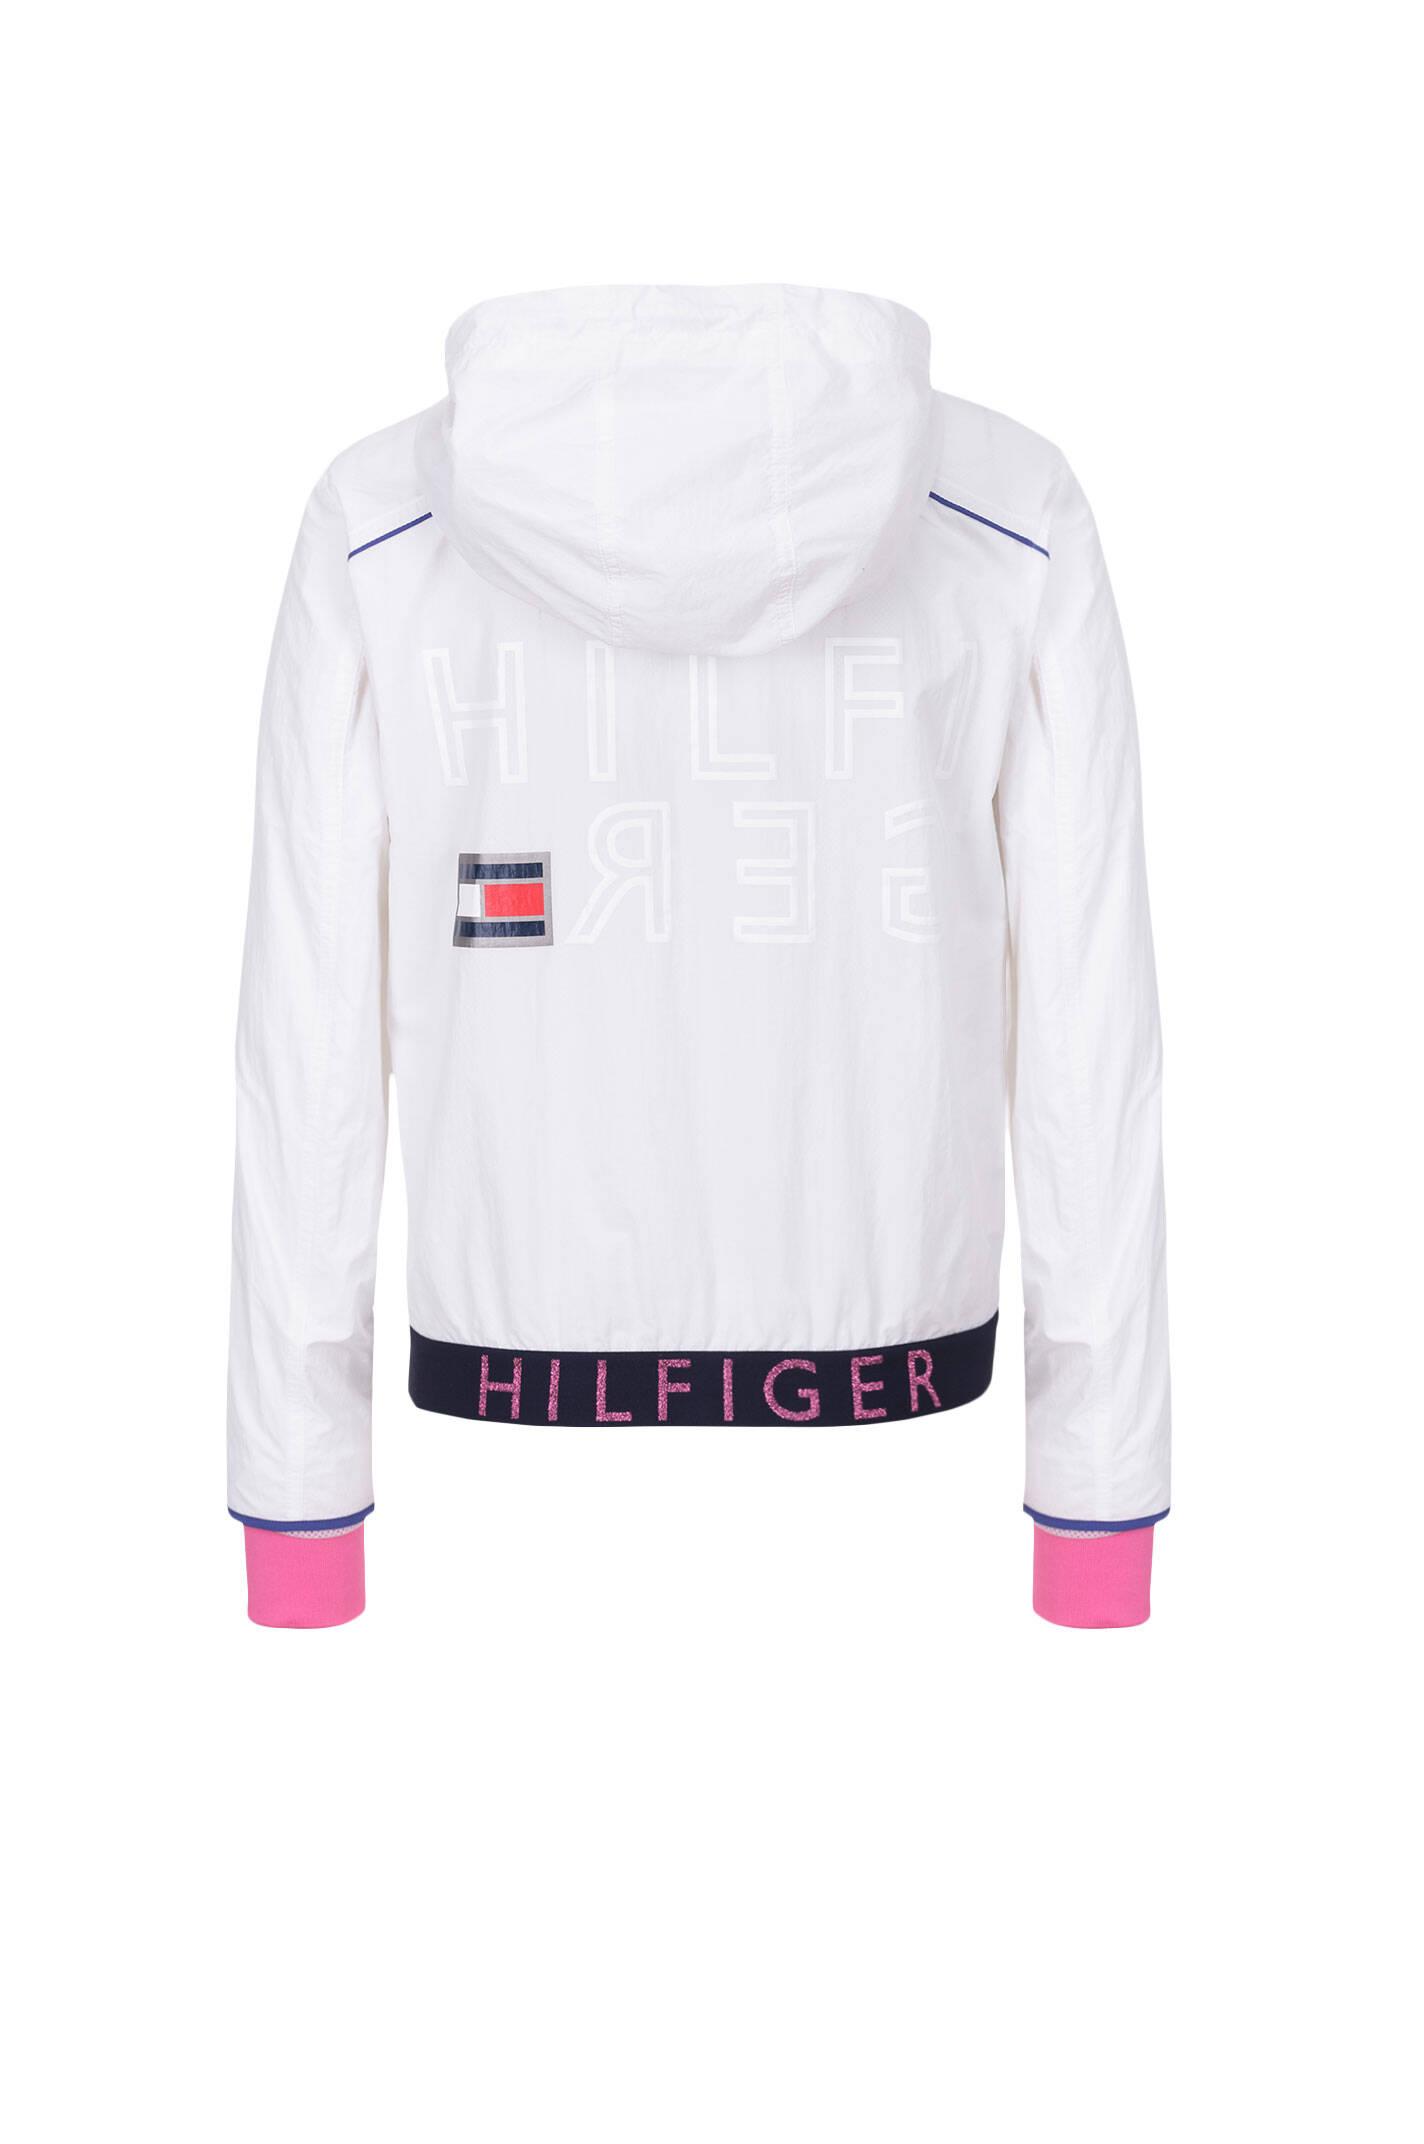 romana windbreaker jacket tommy hilfiger white. Black Bedroom Furniture Sets. Home Design Ideas